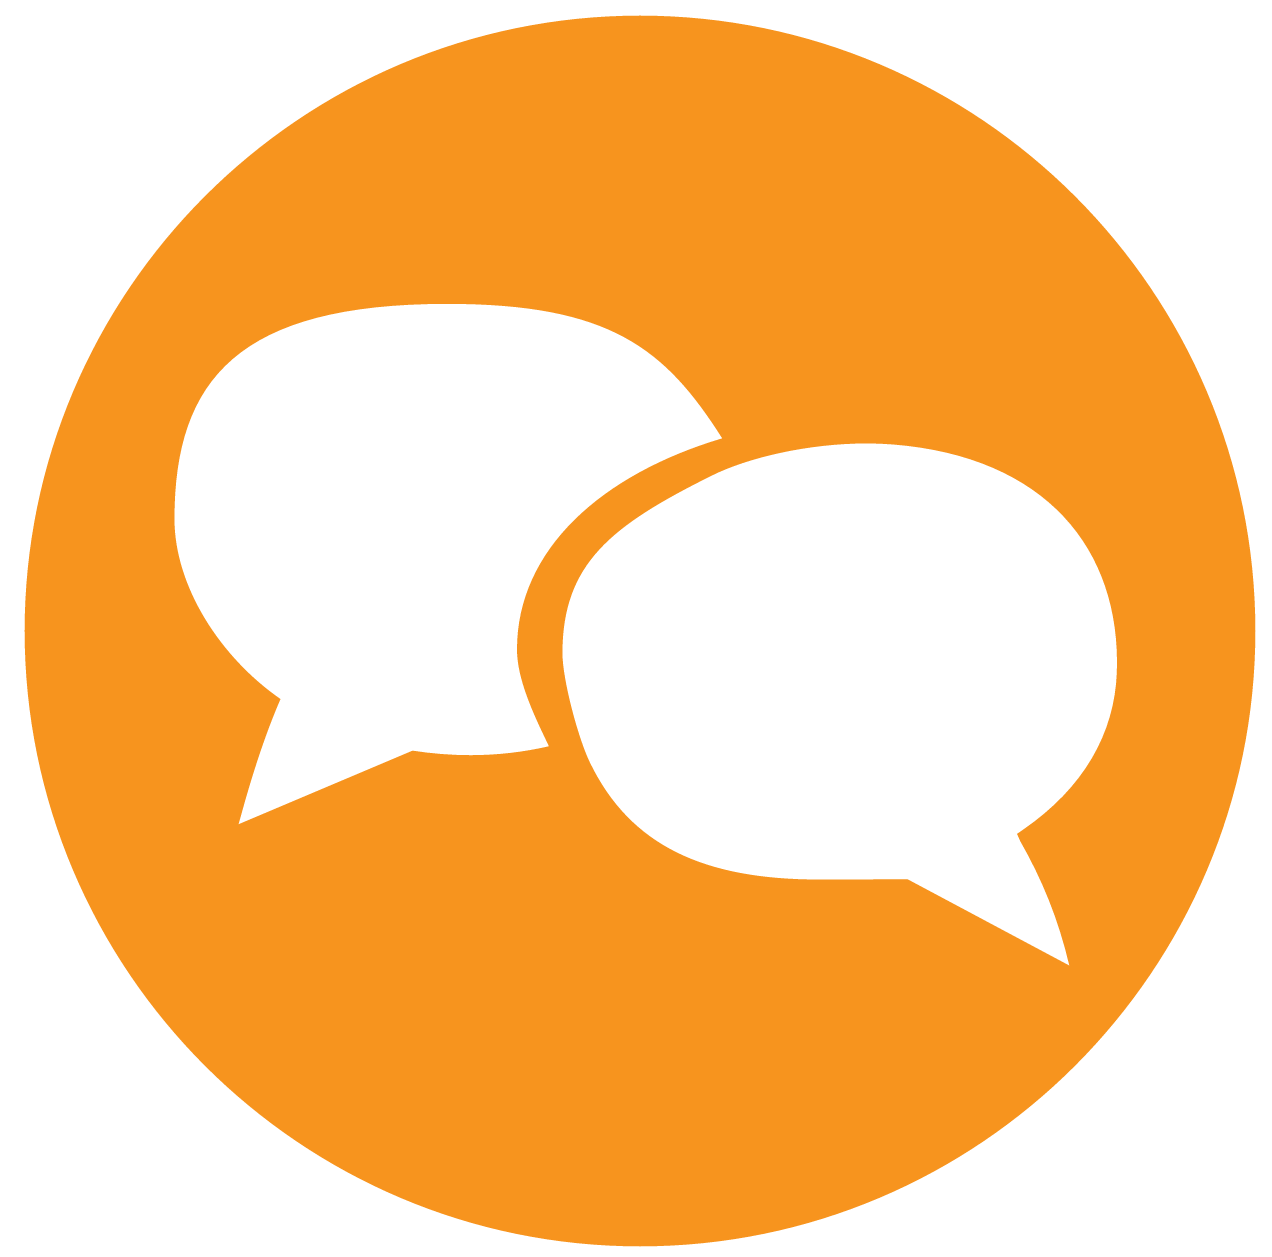 Engagement clipart community engagement. Communities matter training strengths